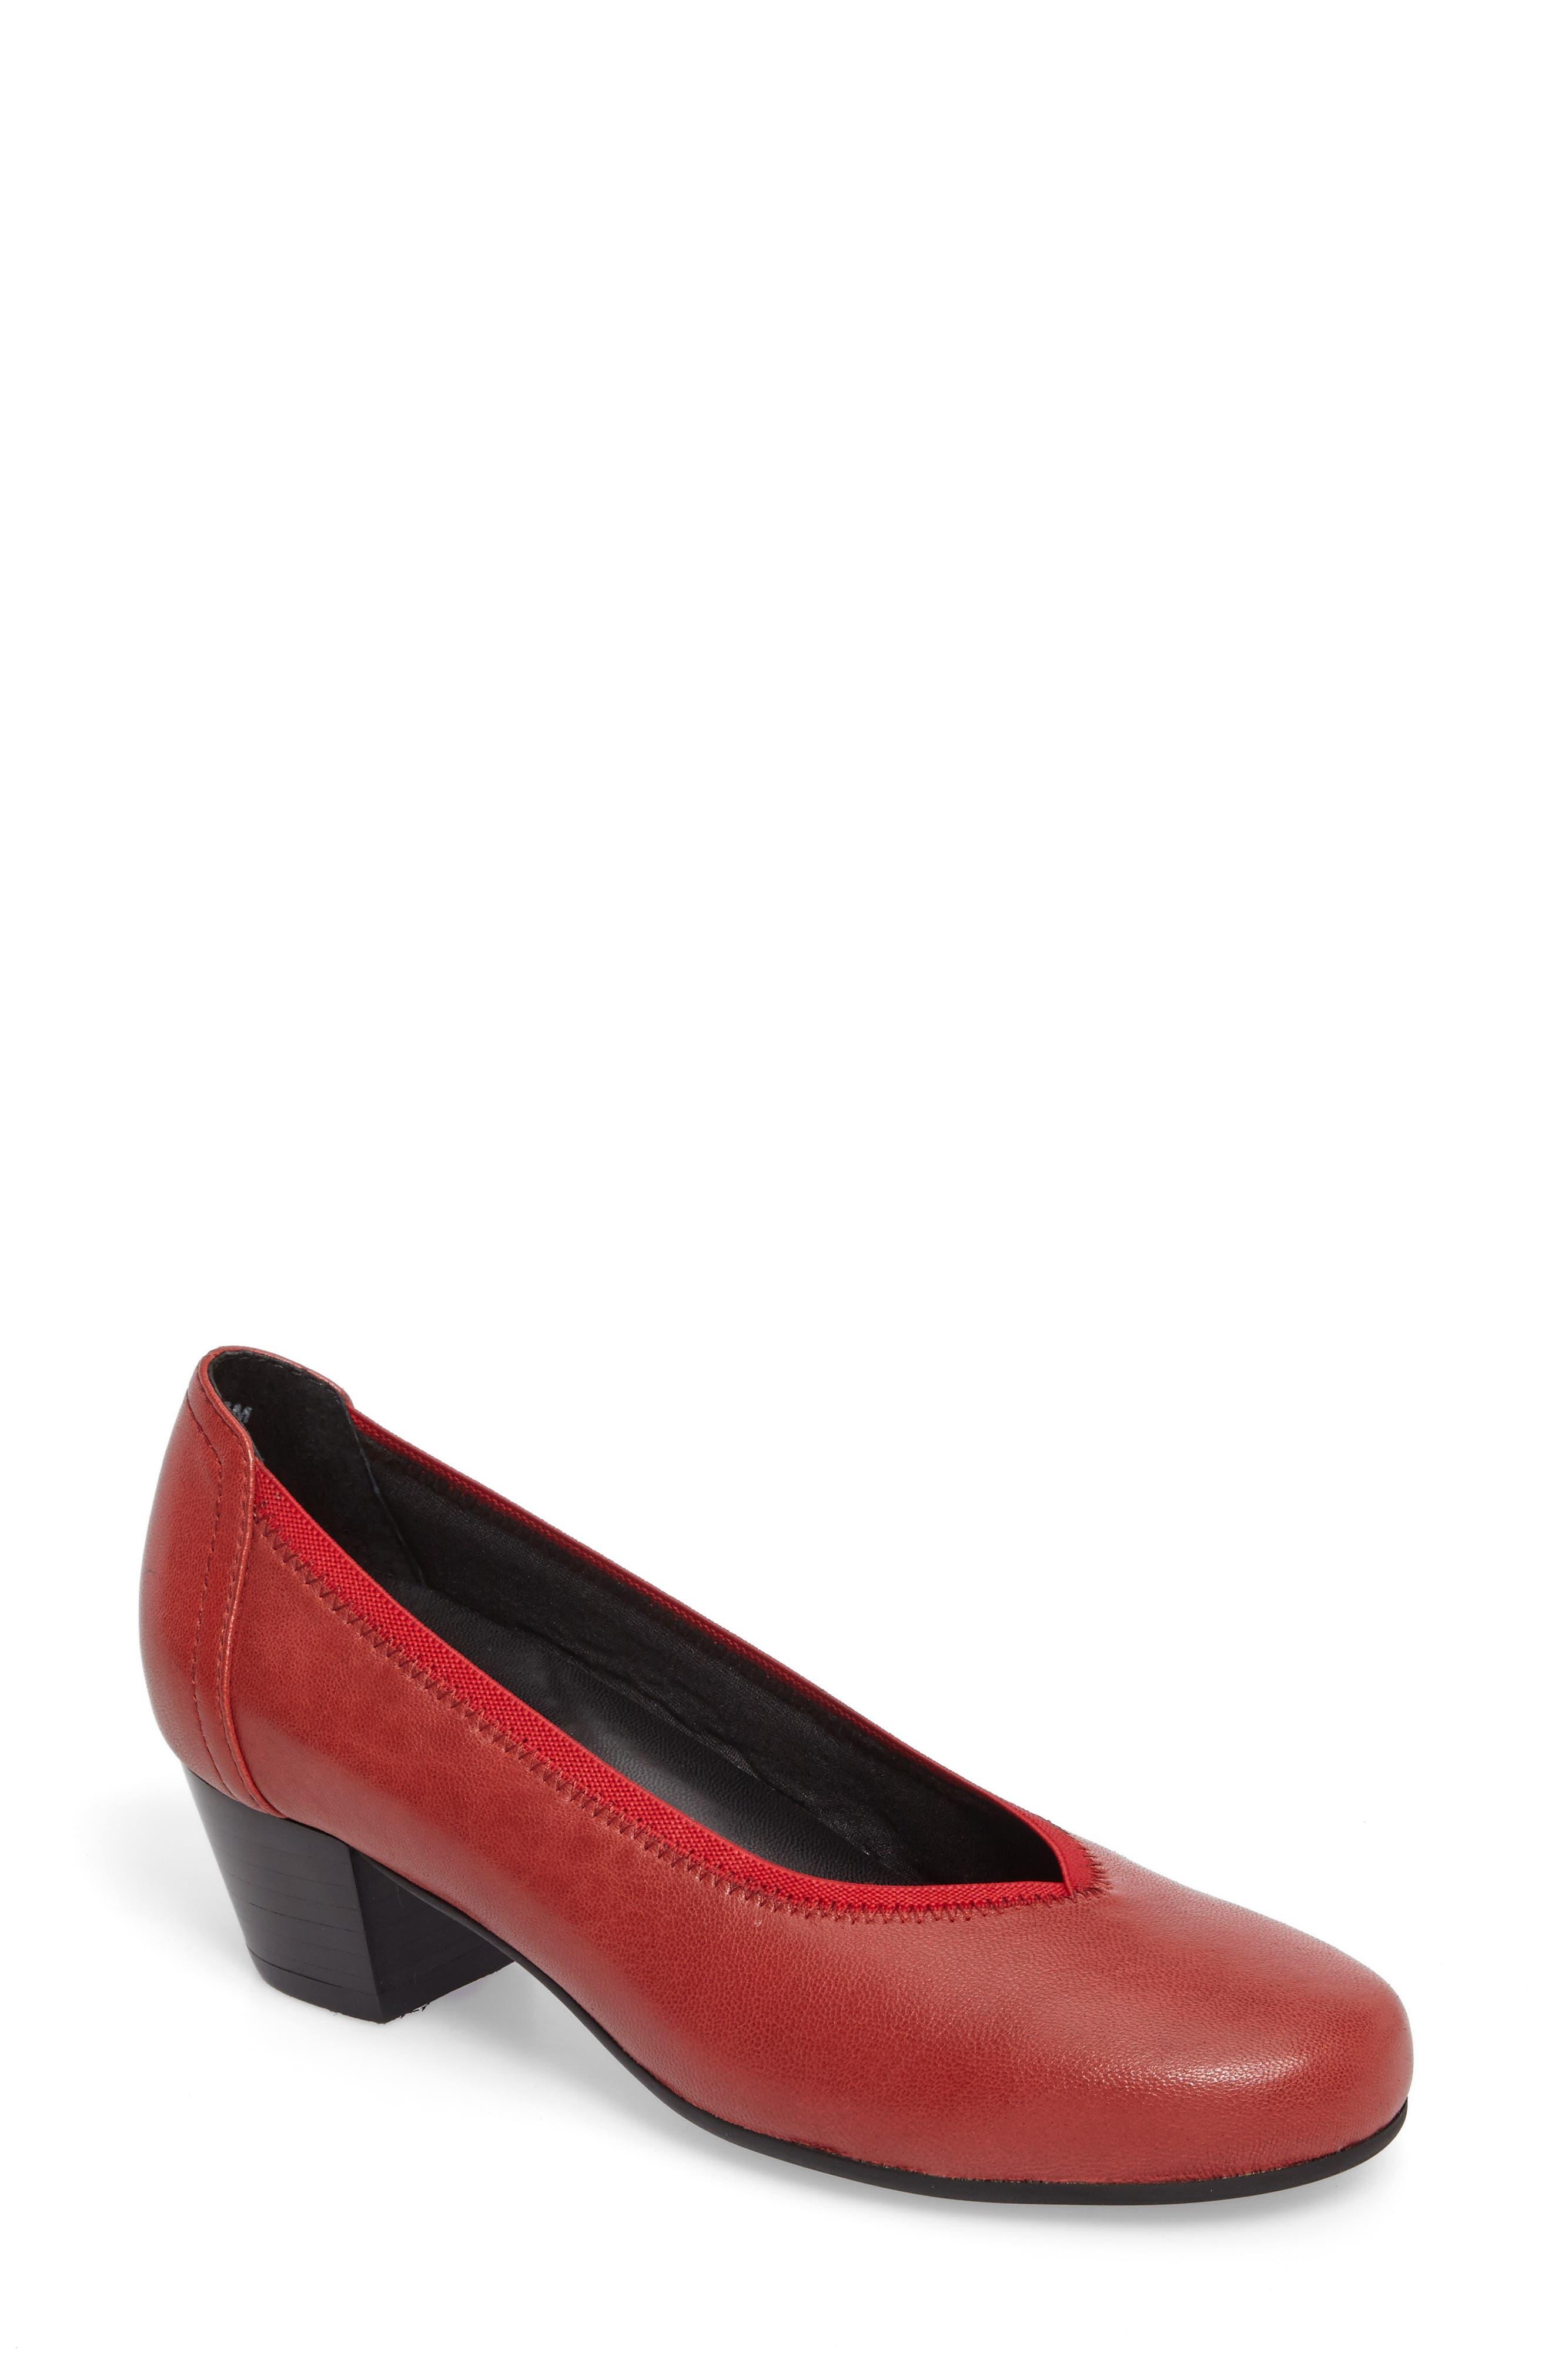 Madera Pump,                             Main thumbnail 1, color,                             Red Leather